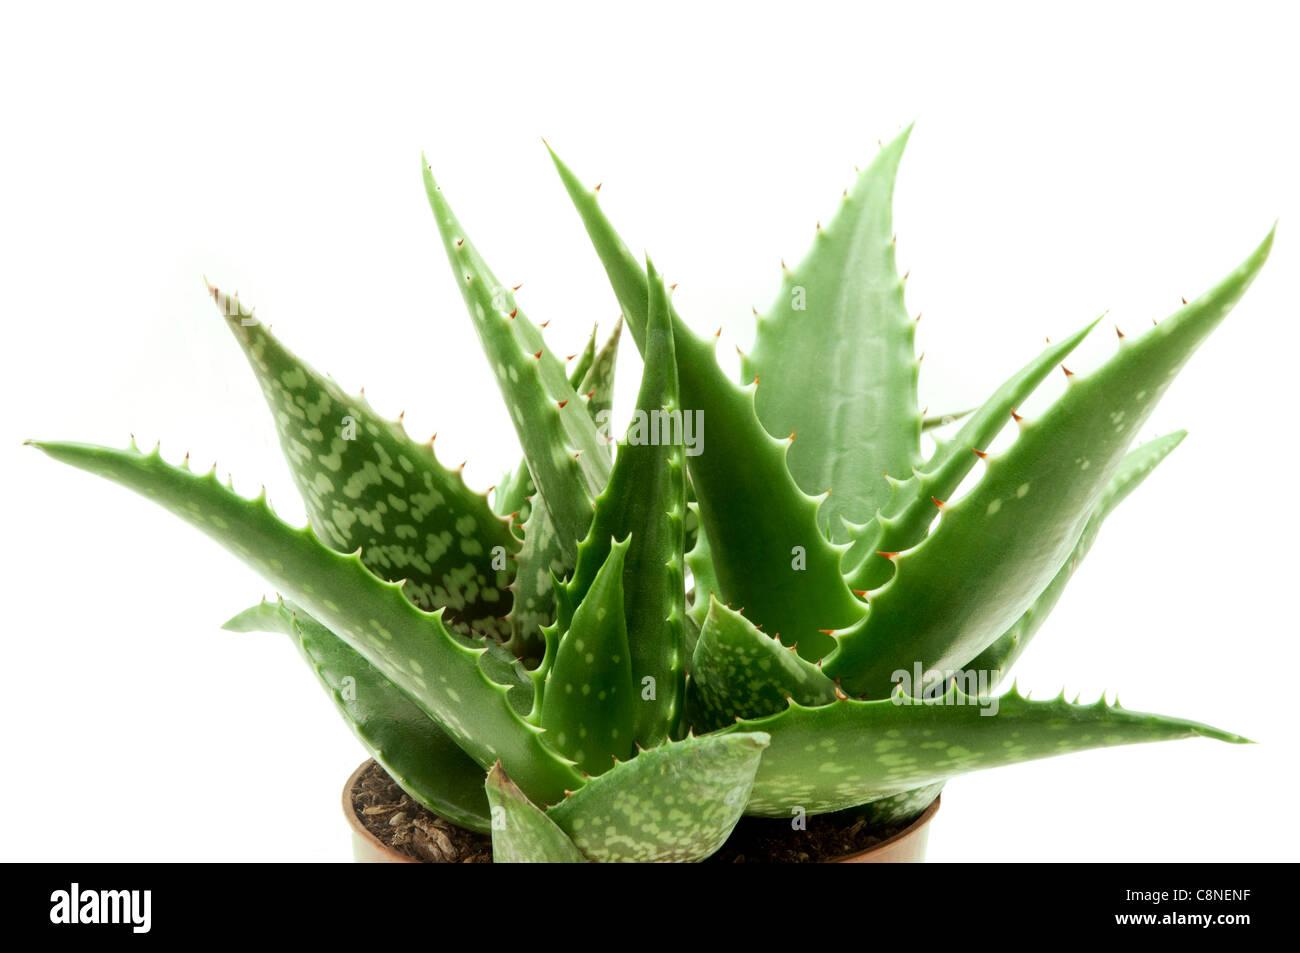 Aloe vera var. chinensis on a white background - Stock Image